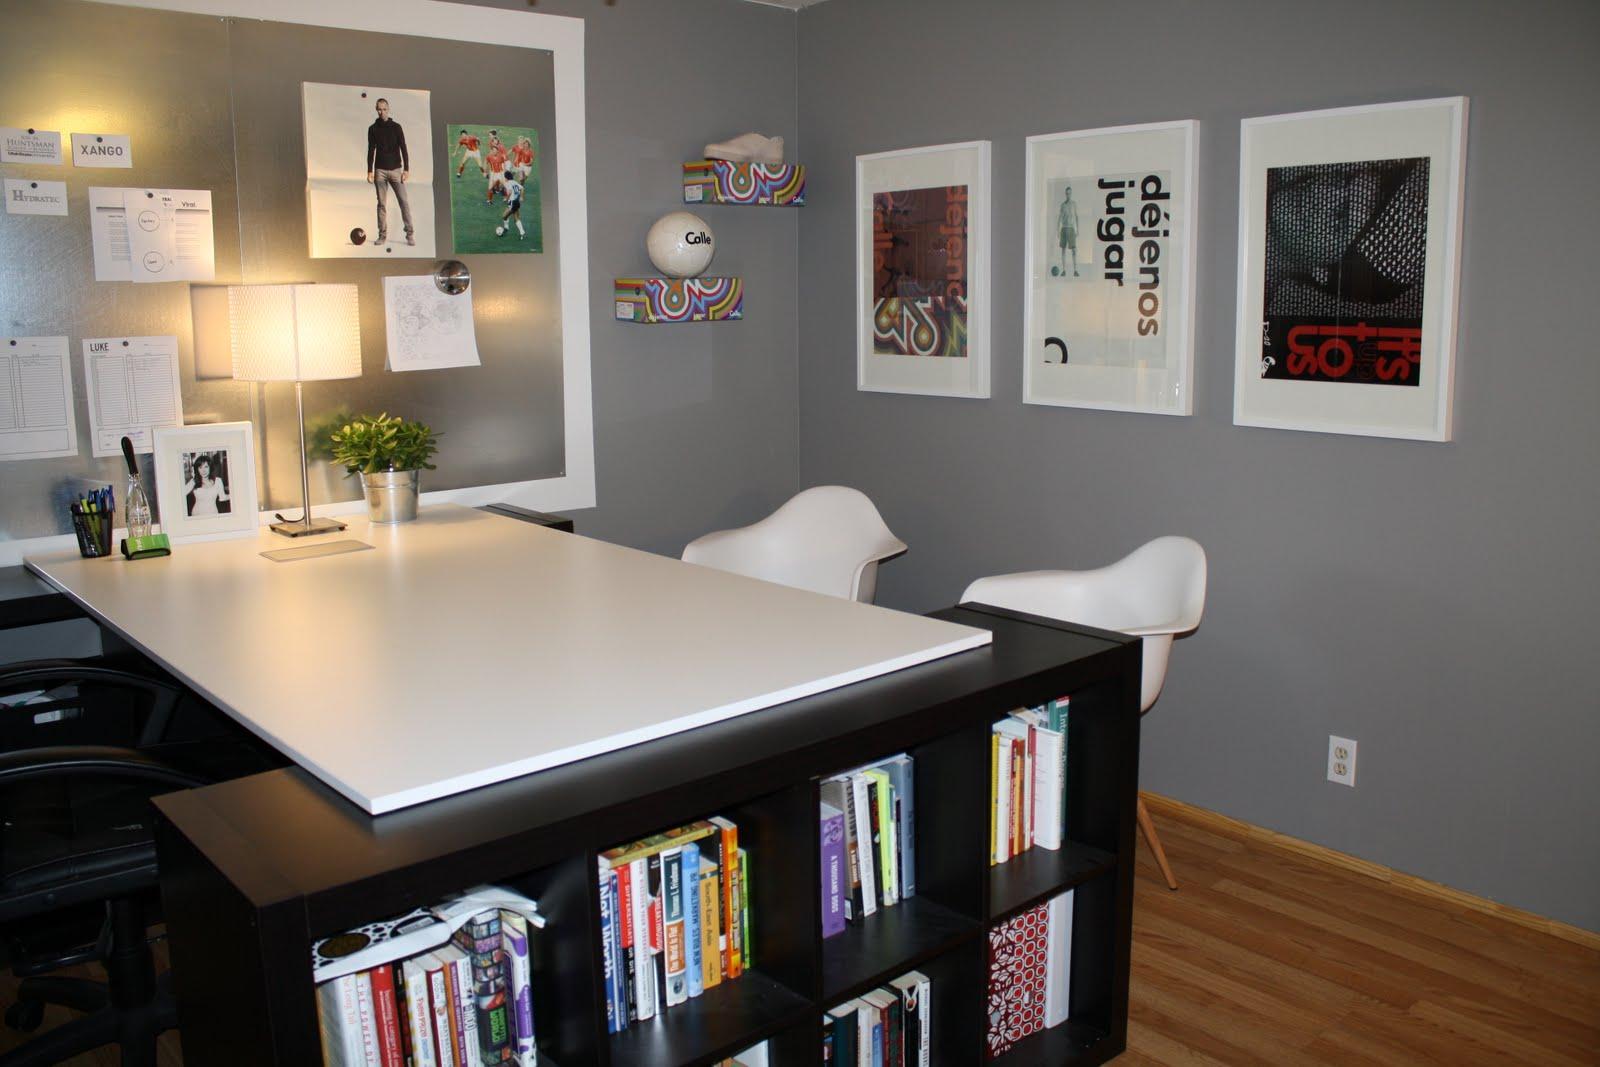 handycrafted home office. Black Bedroom Furniture Sets. Home Design Ideas